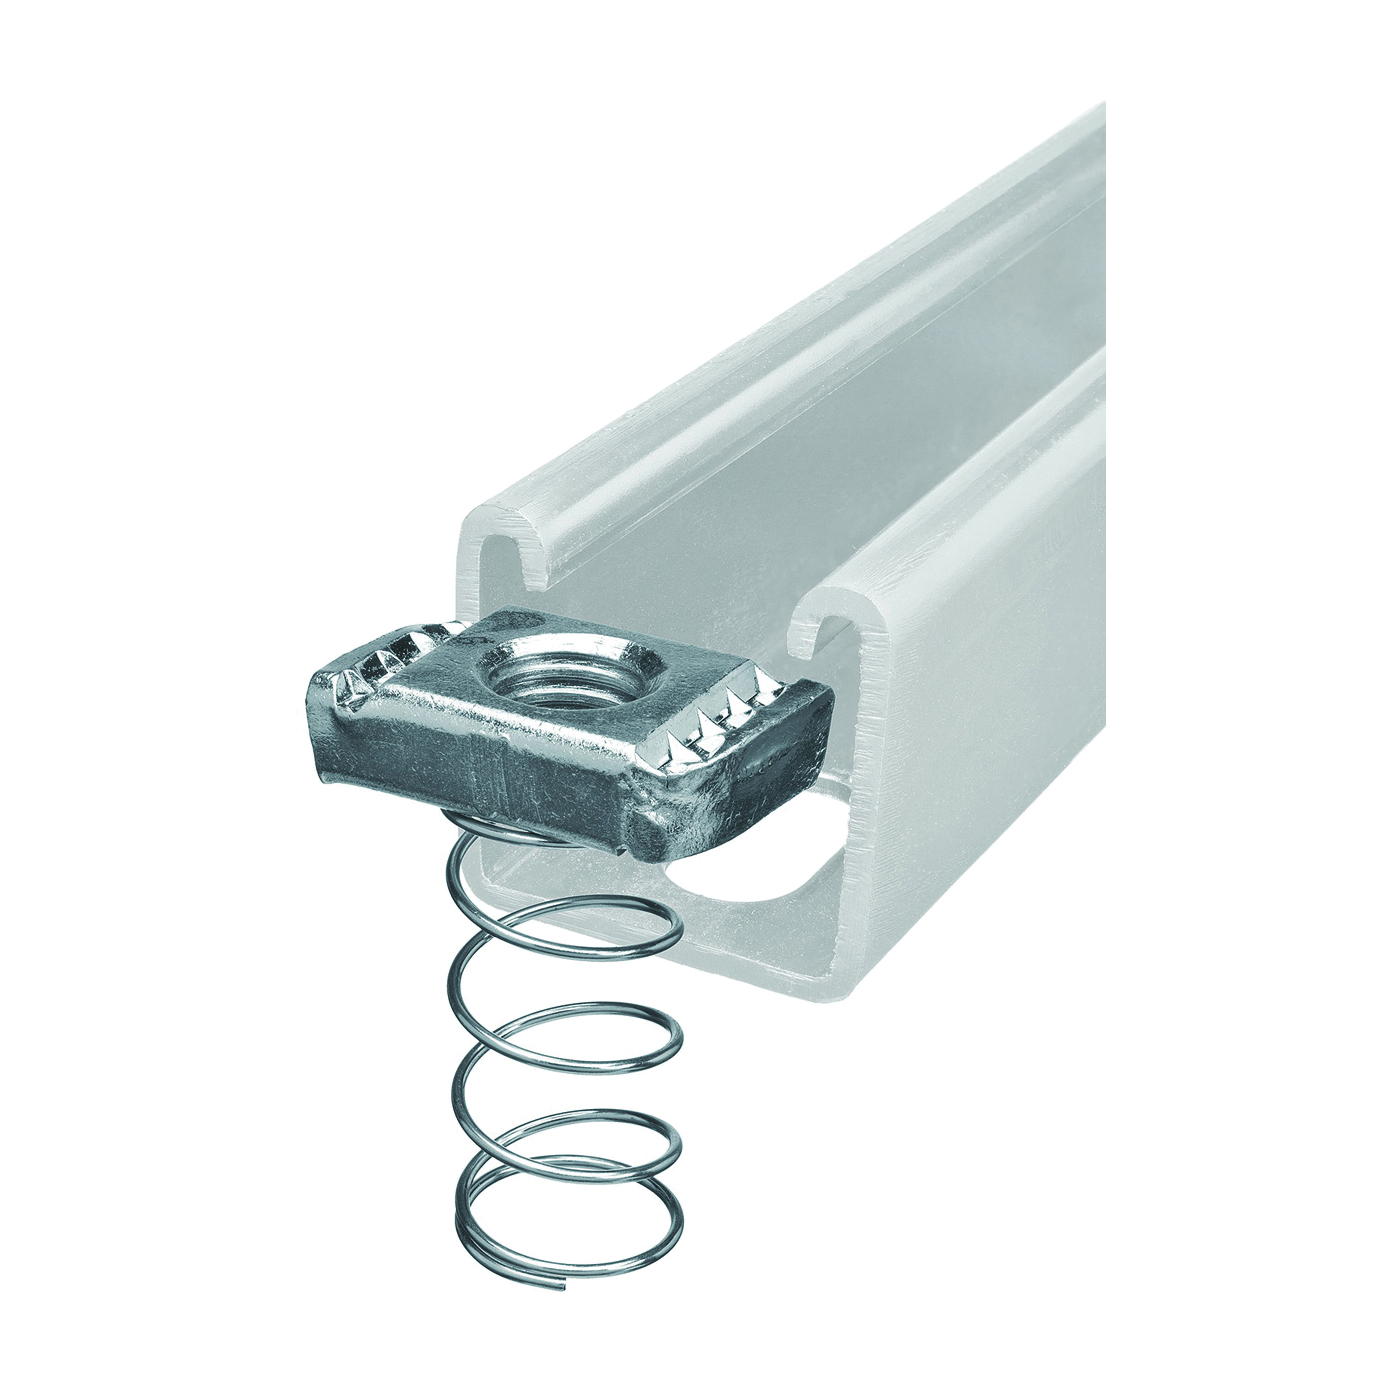 Picture of SuperStrut 100 Series ZA1001/4EG-10 Spring Nut, Steel, Galvanized